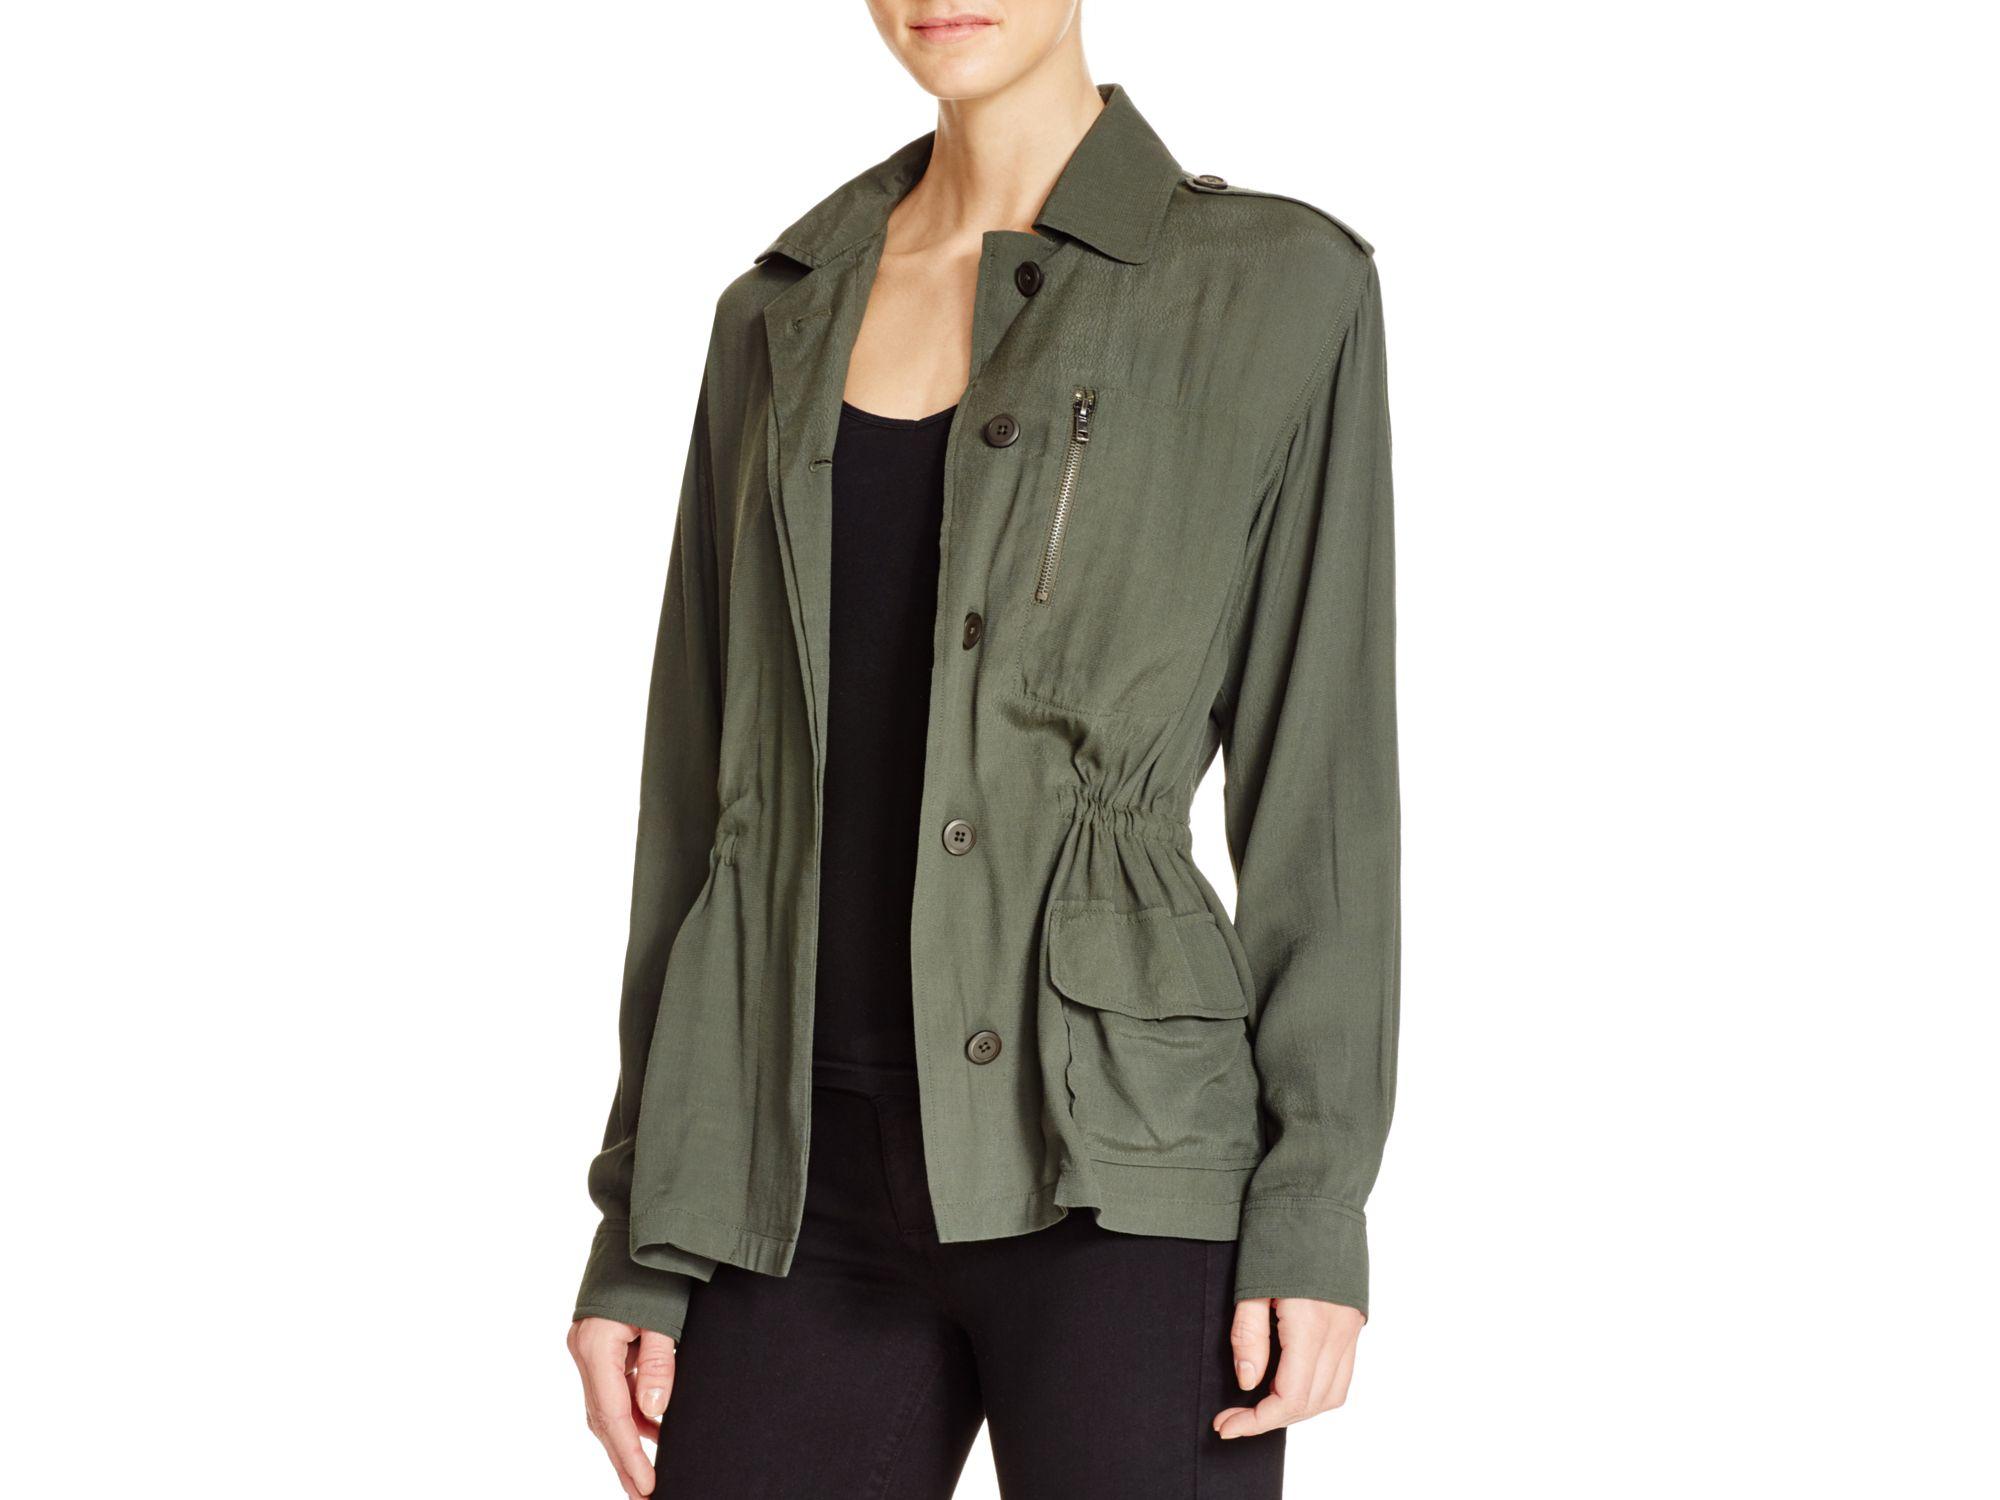 Bb dakota Lana Crepe Lightweight Jacket in Green | Lyst